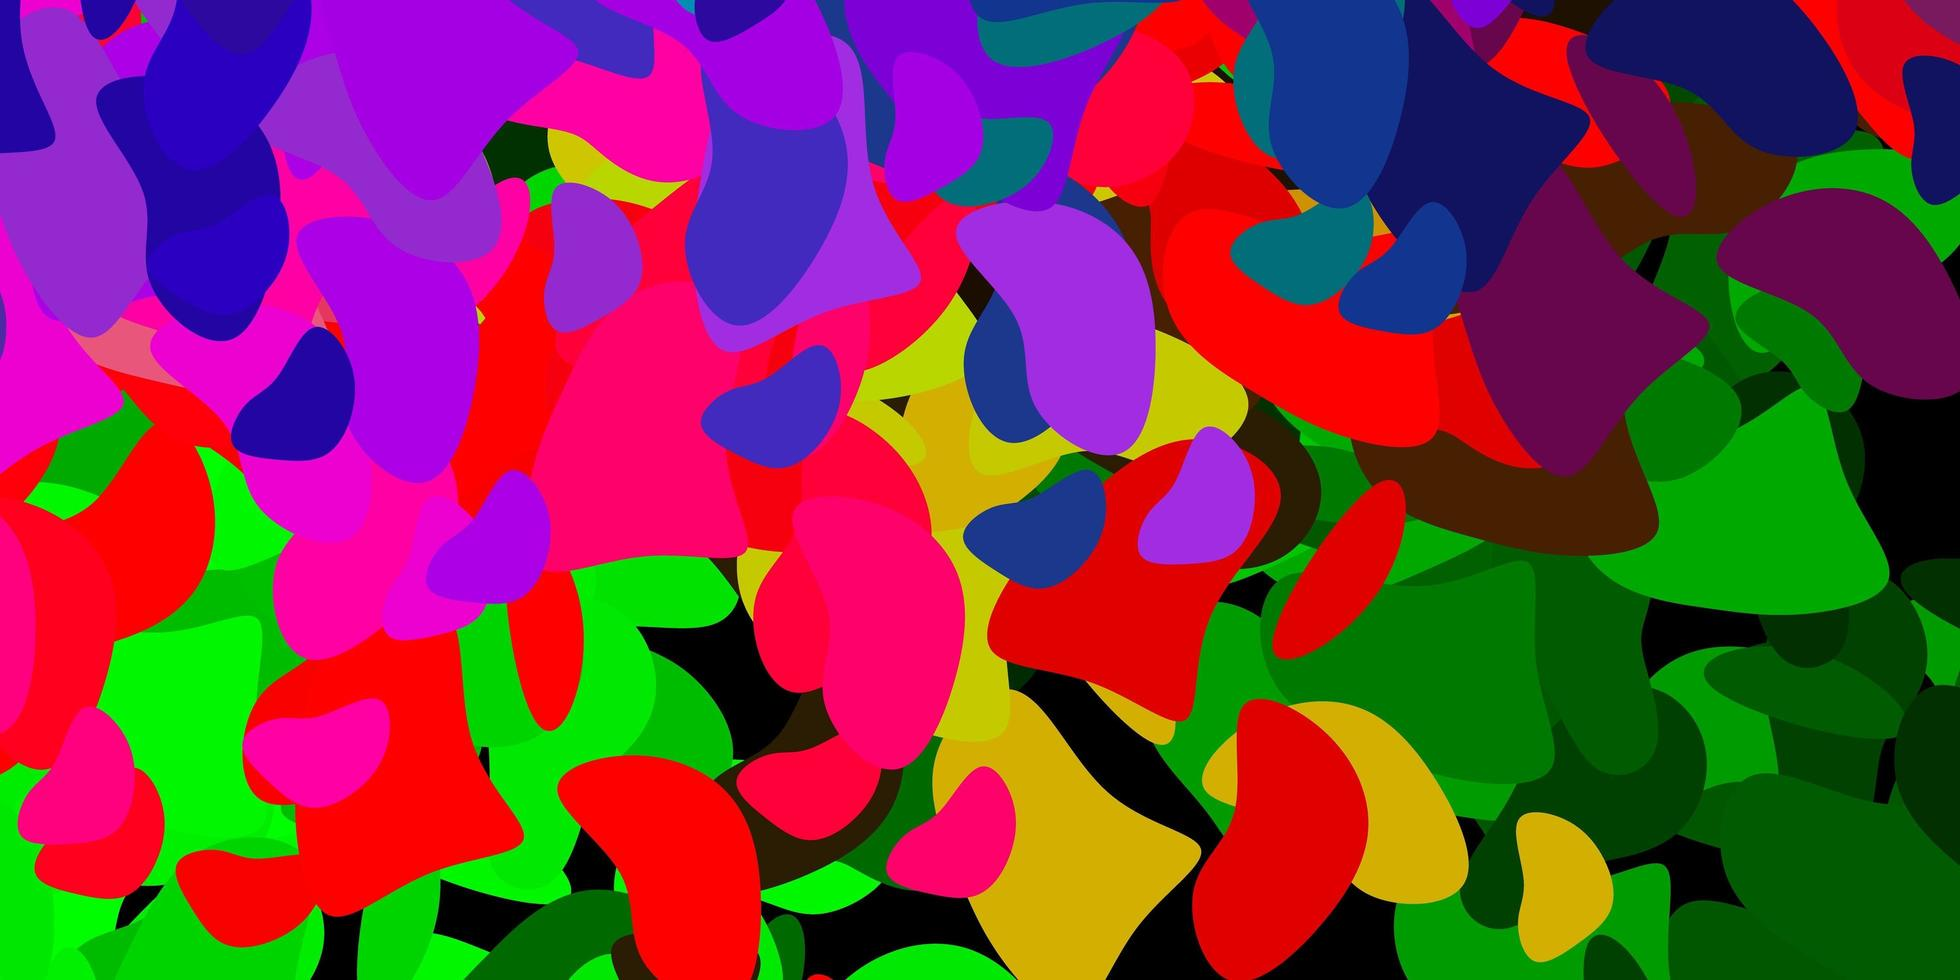 textura vector rosa claro, verde con formas de memphis.